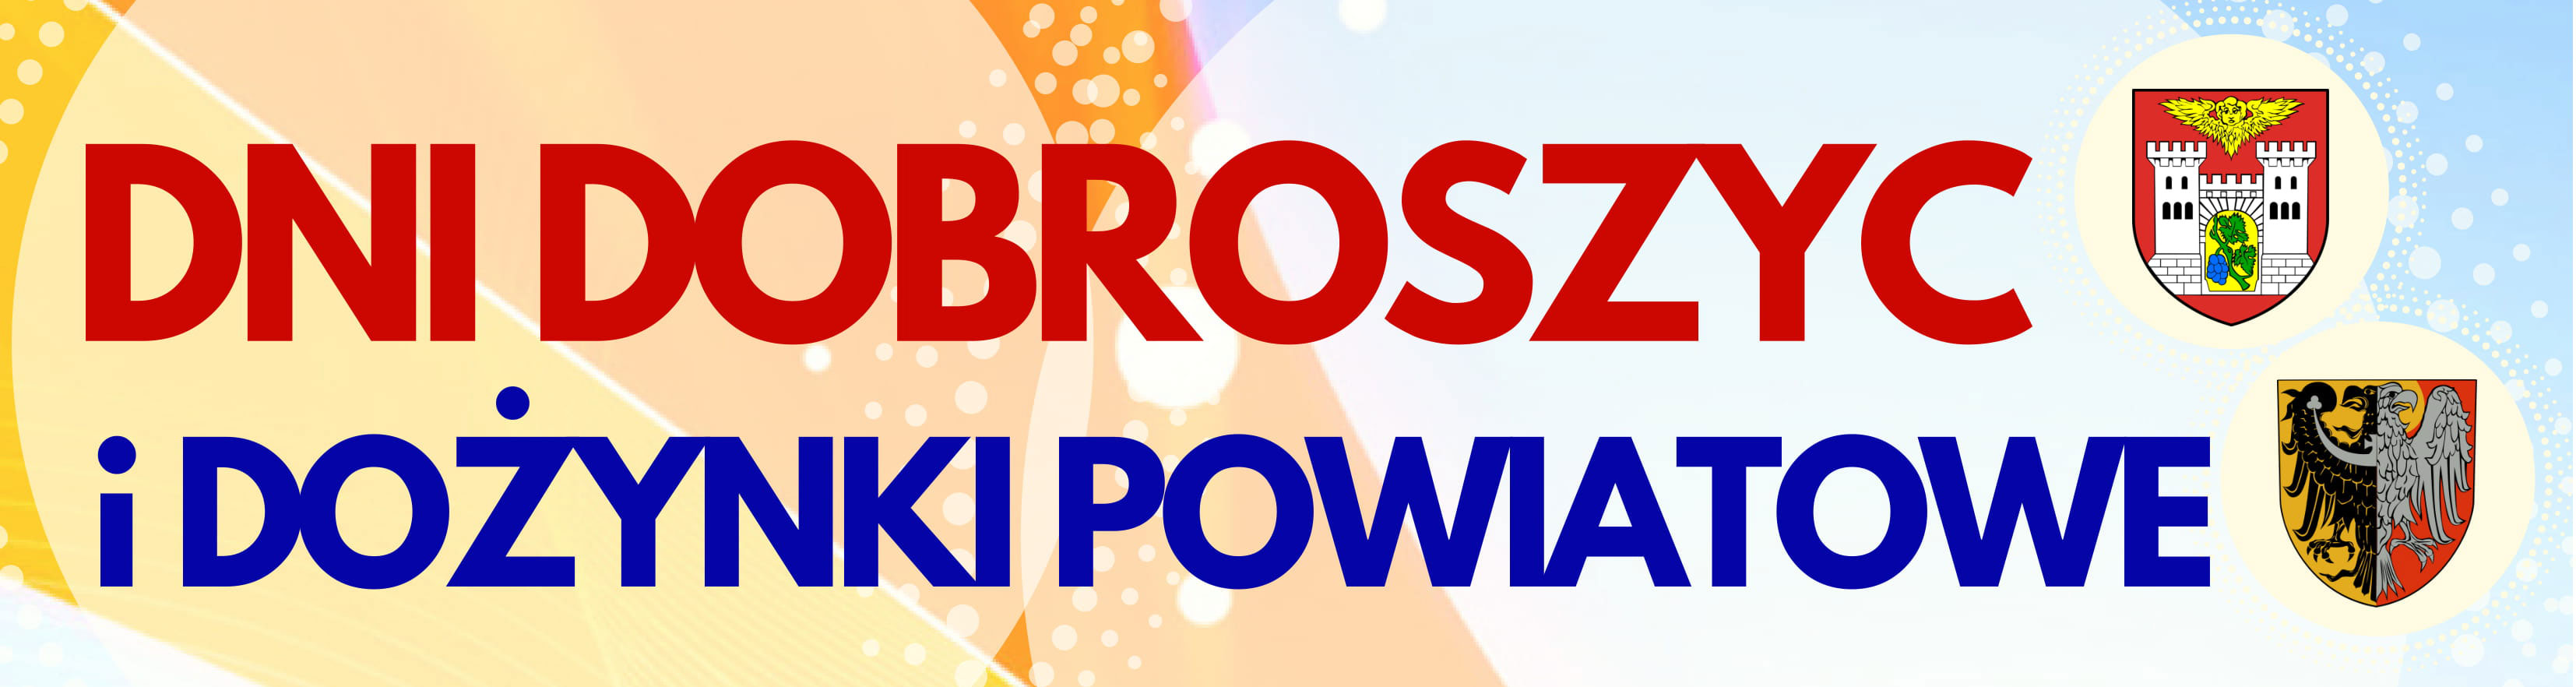 Dni Dobroszyc